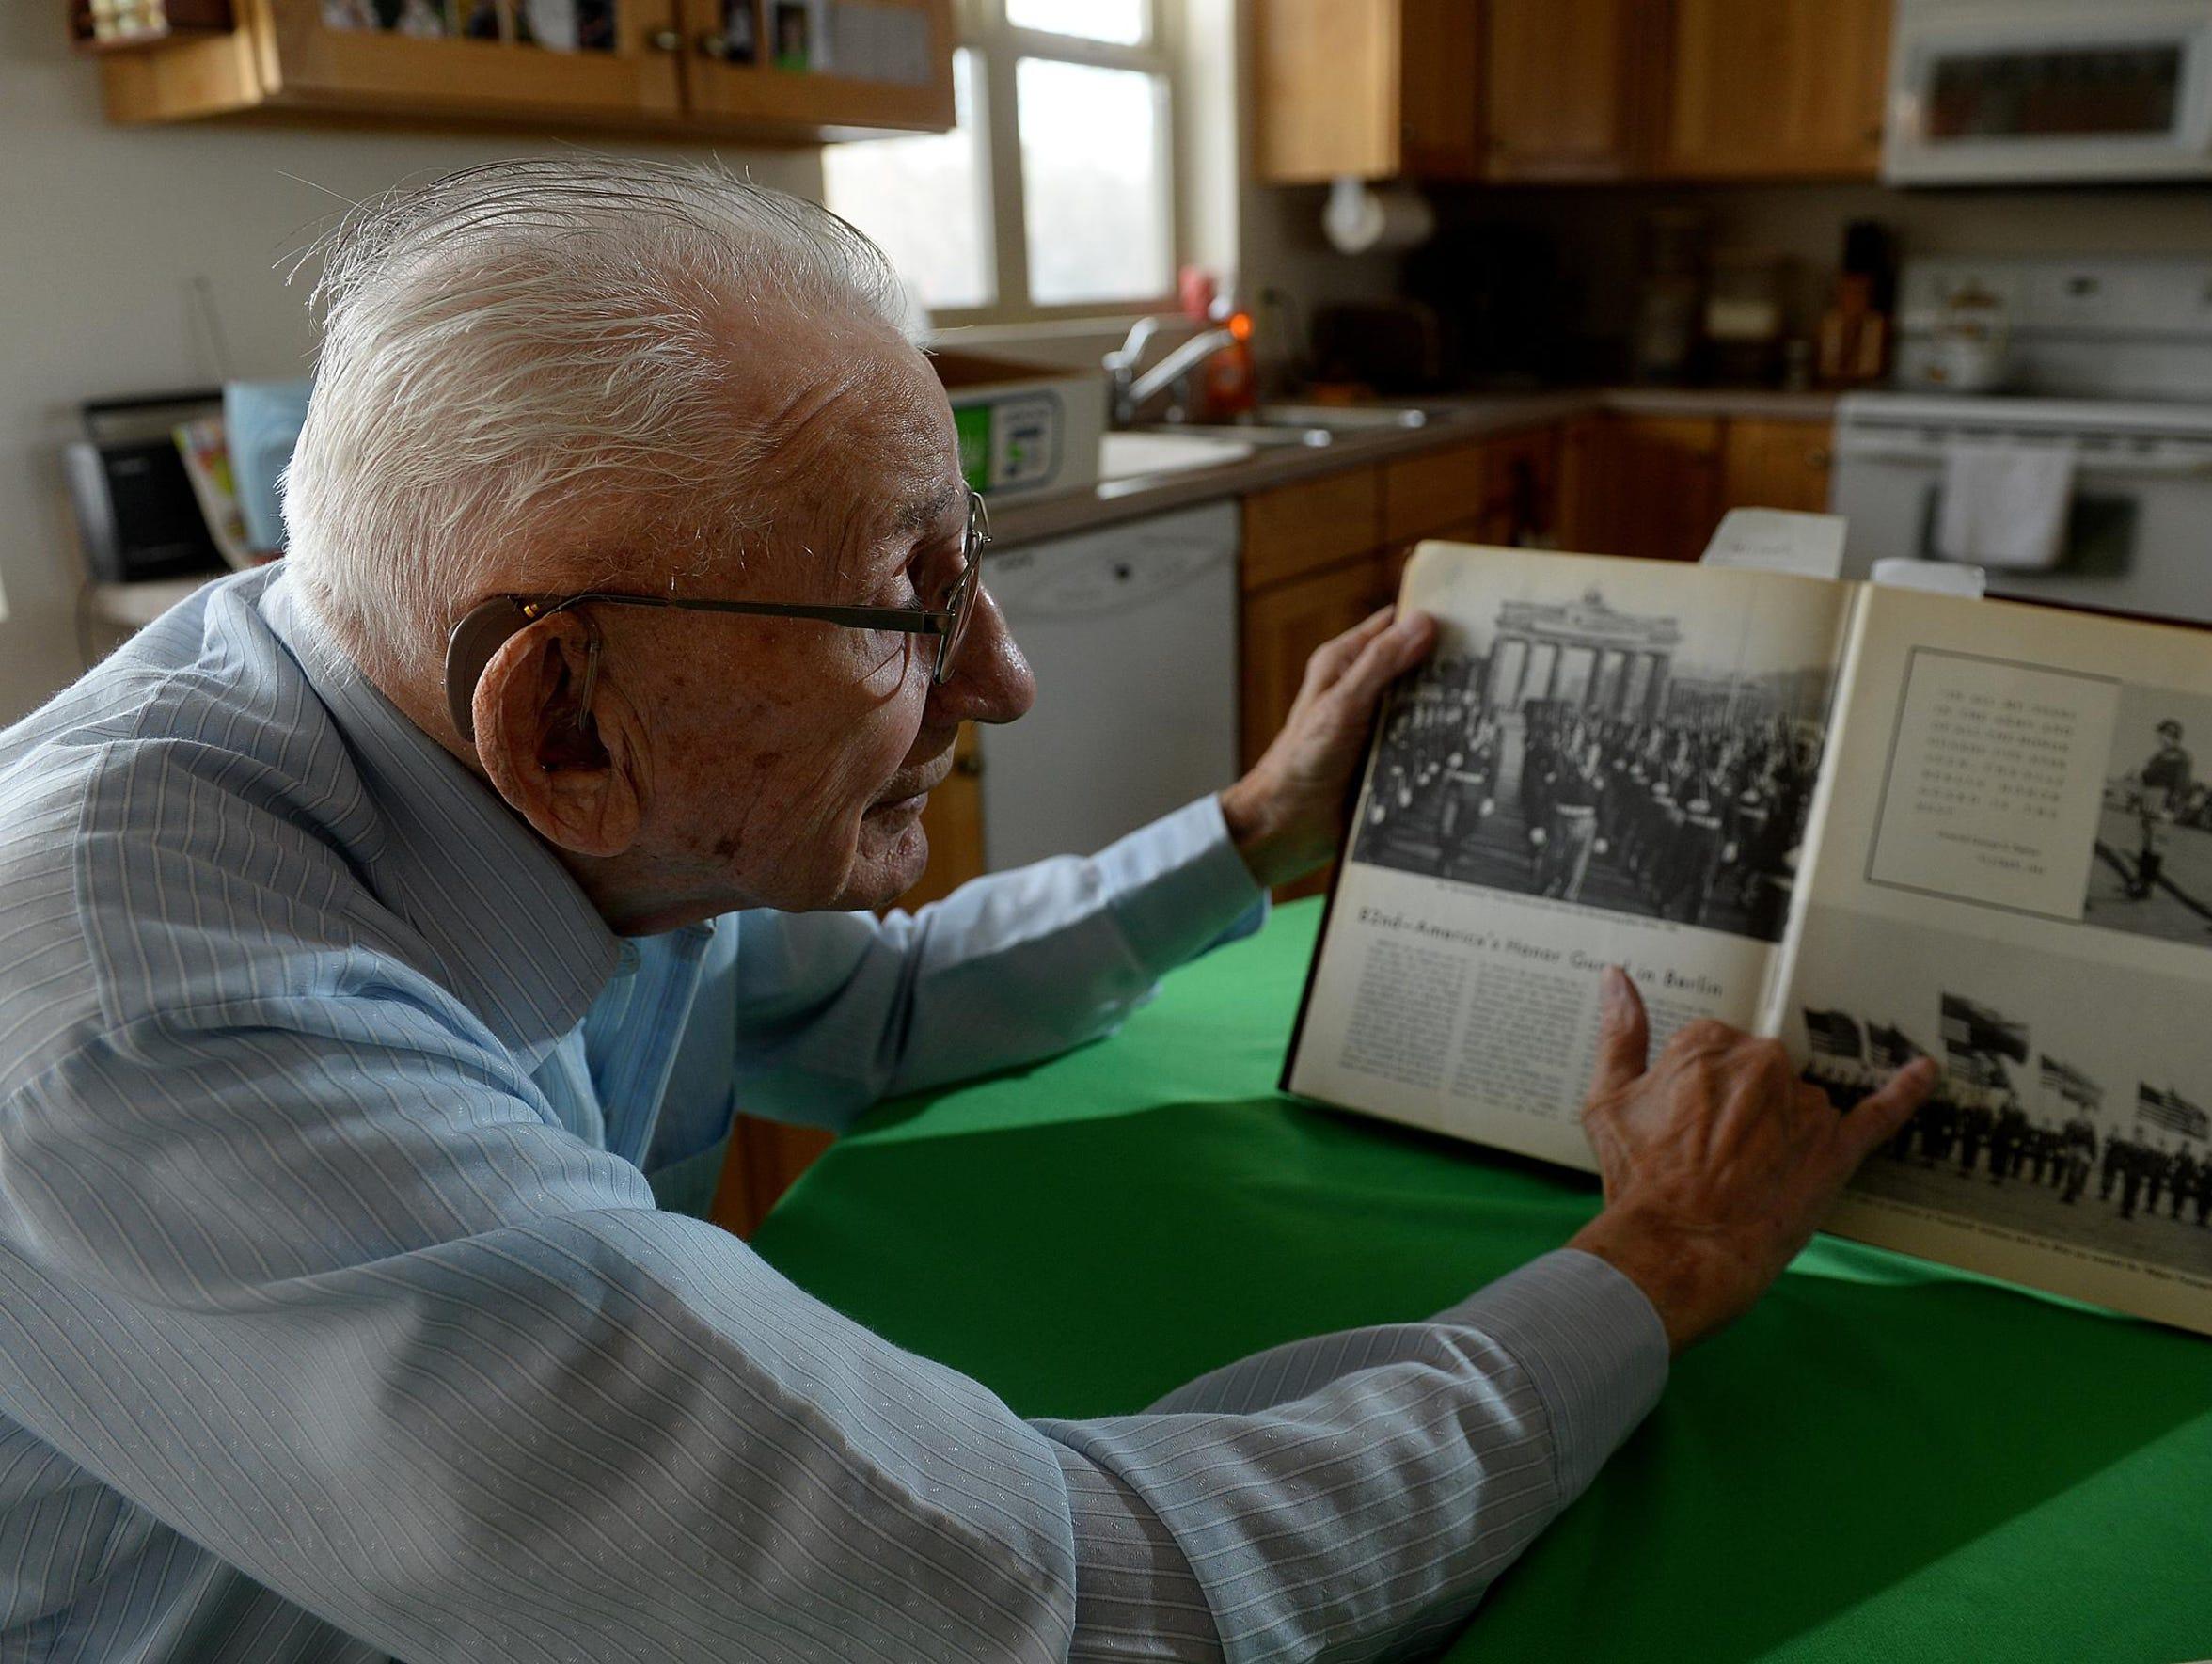 Bud Olson, a World War II veteran, points to himself